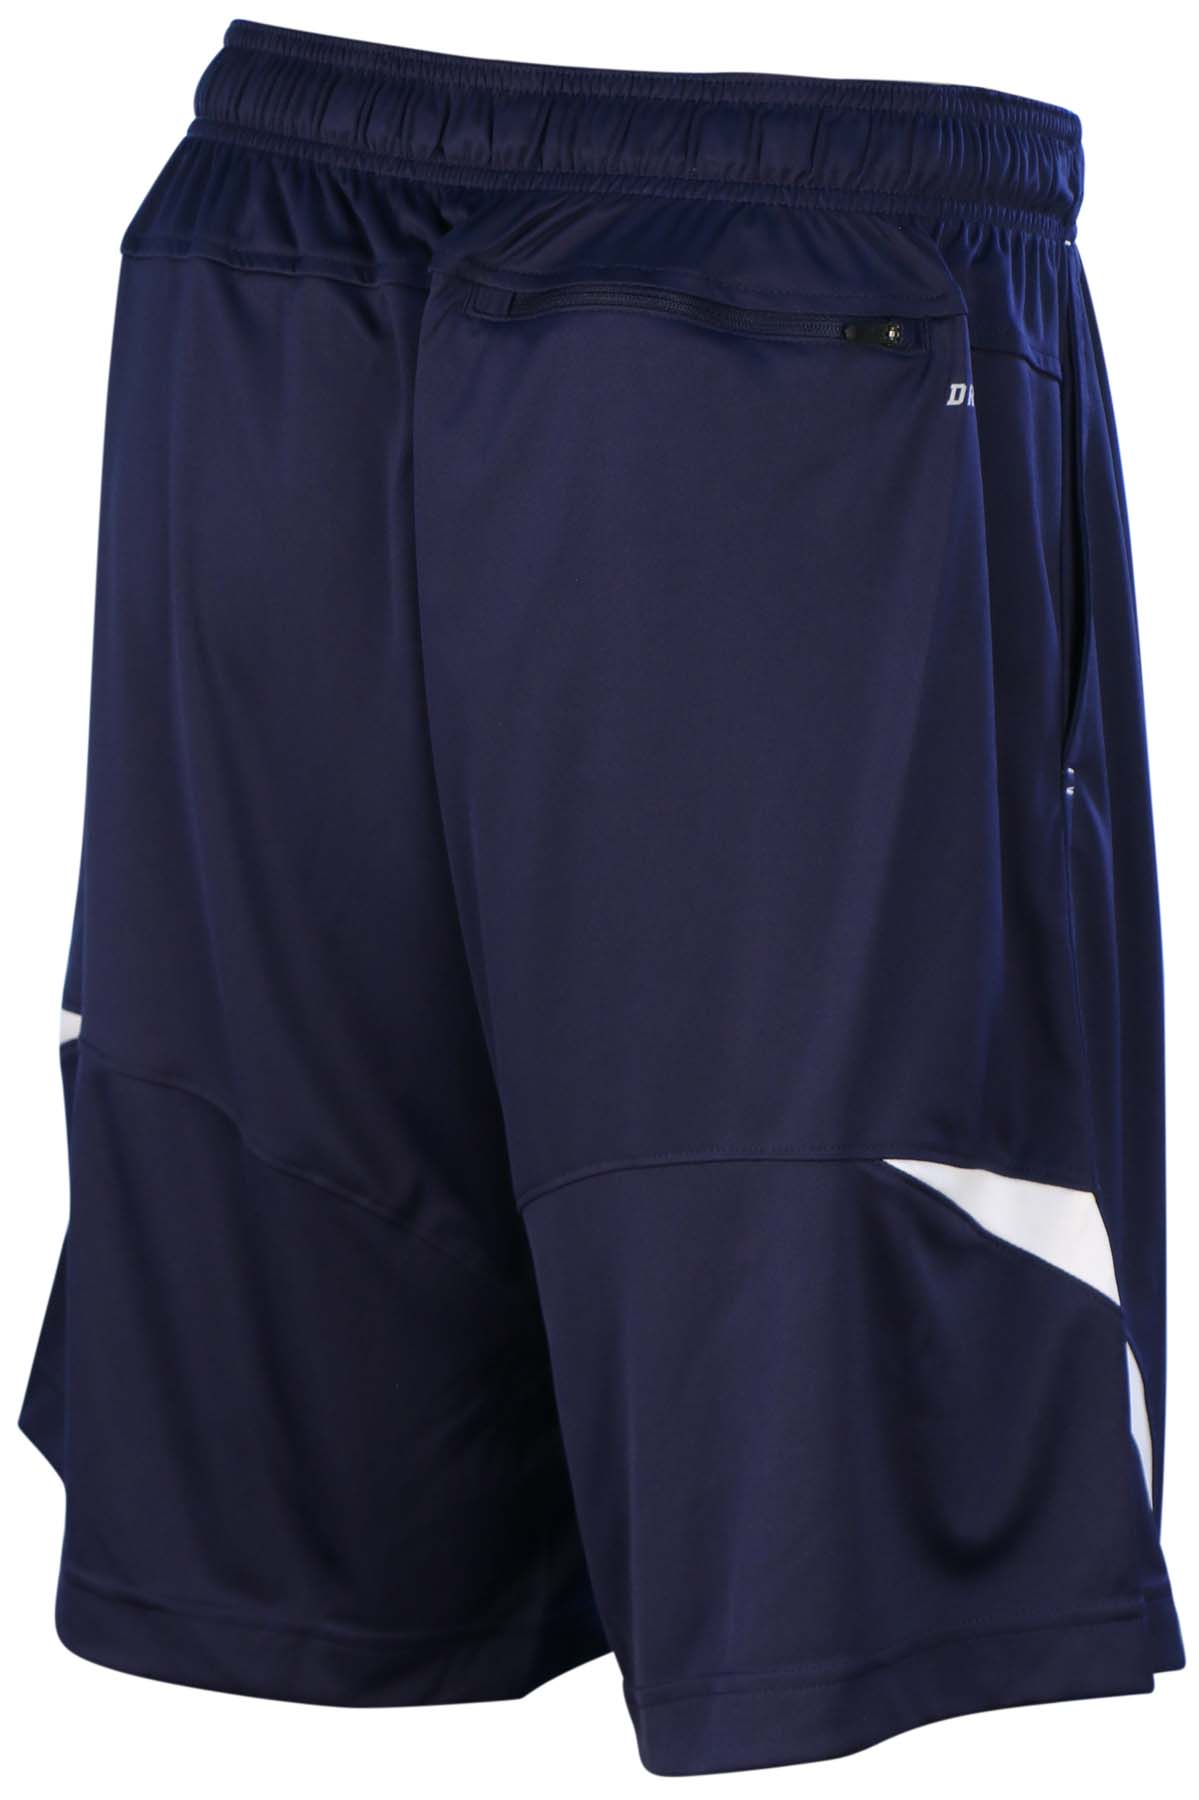 Nike Men's Dri-Fit 3 Pocket Coaches Shorts | eBay